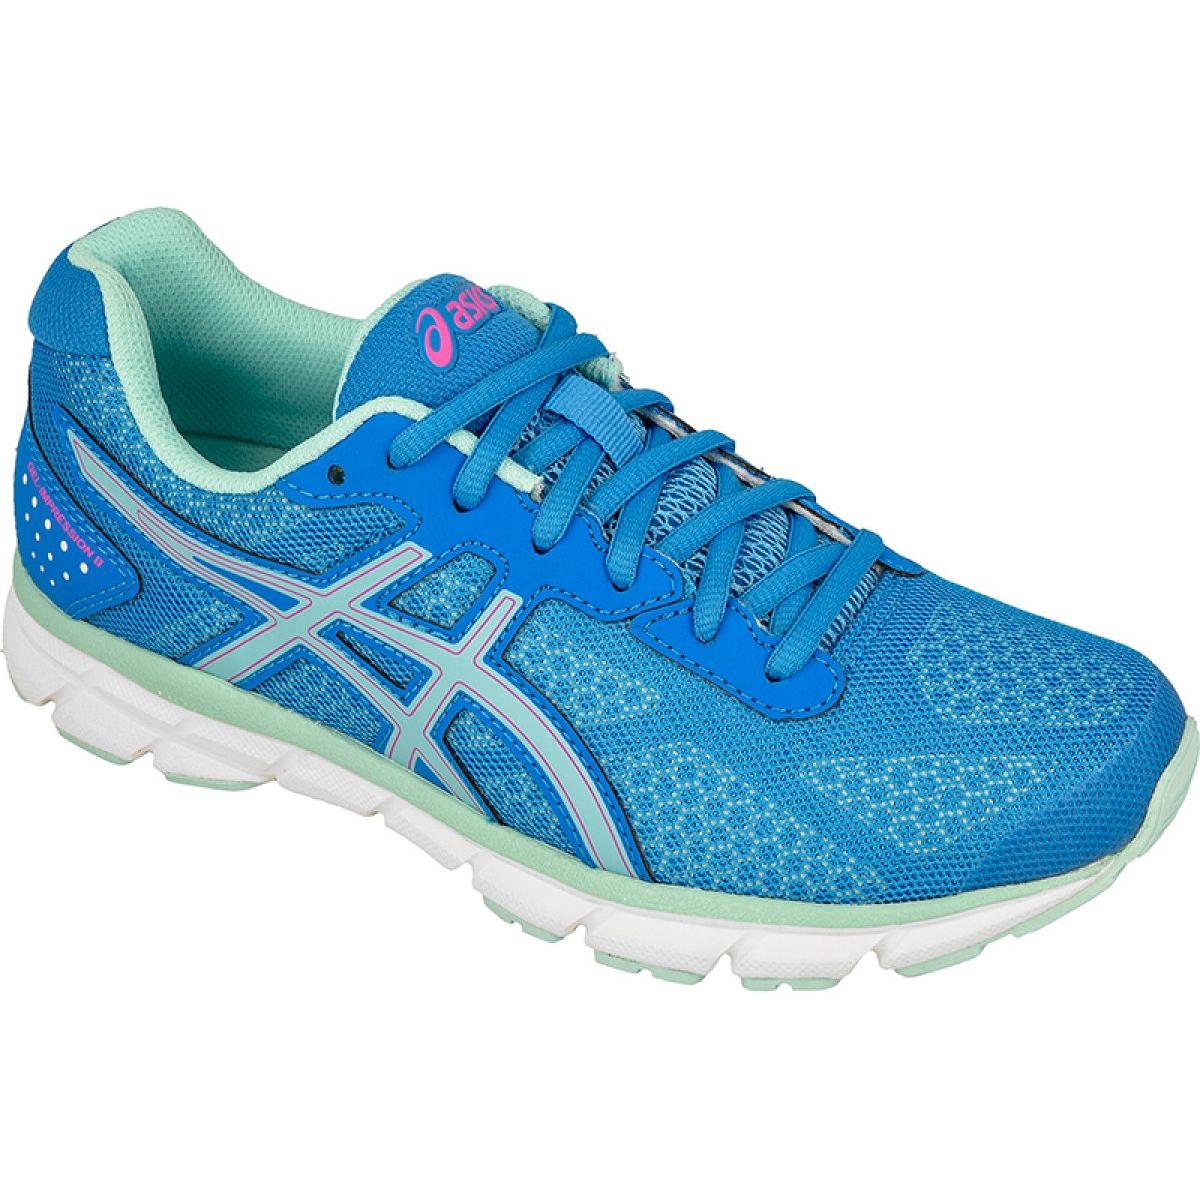 Running shoes Asics Gel-Impression 9 W